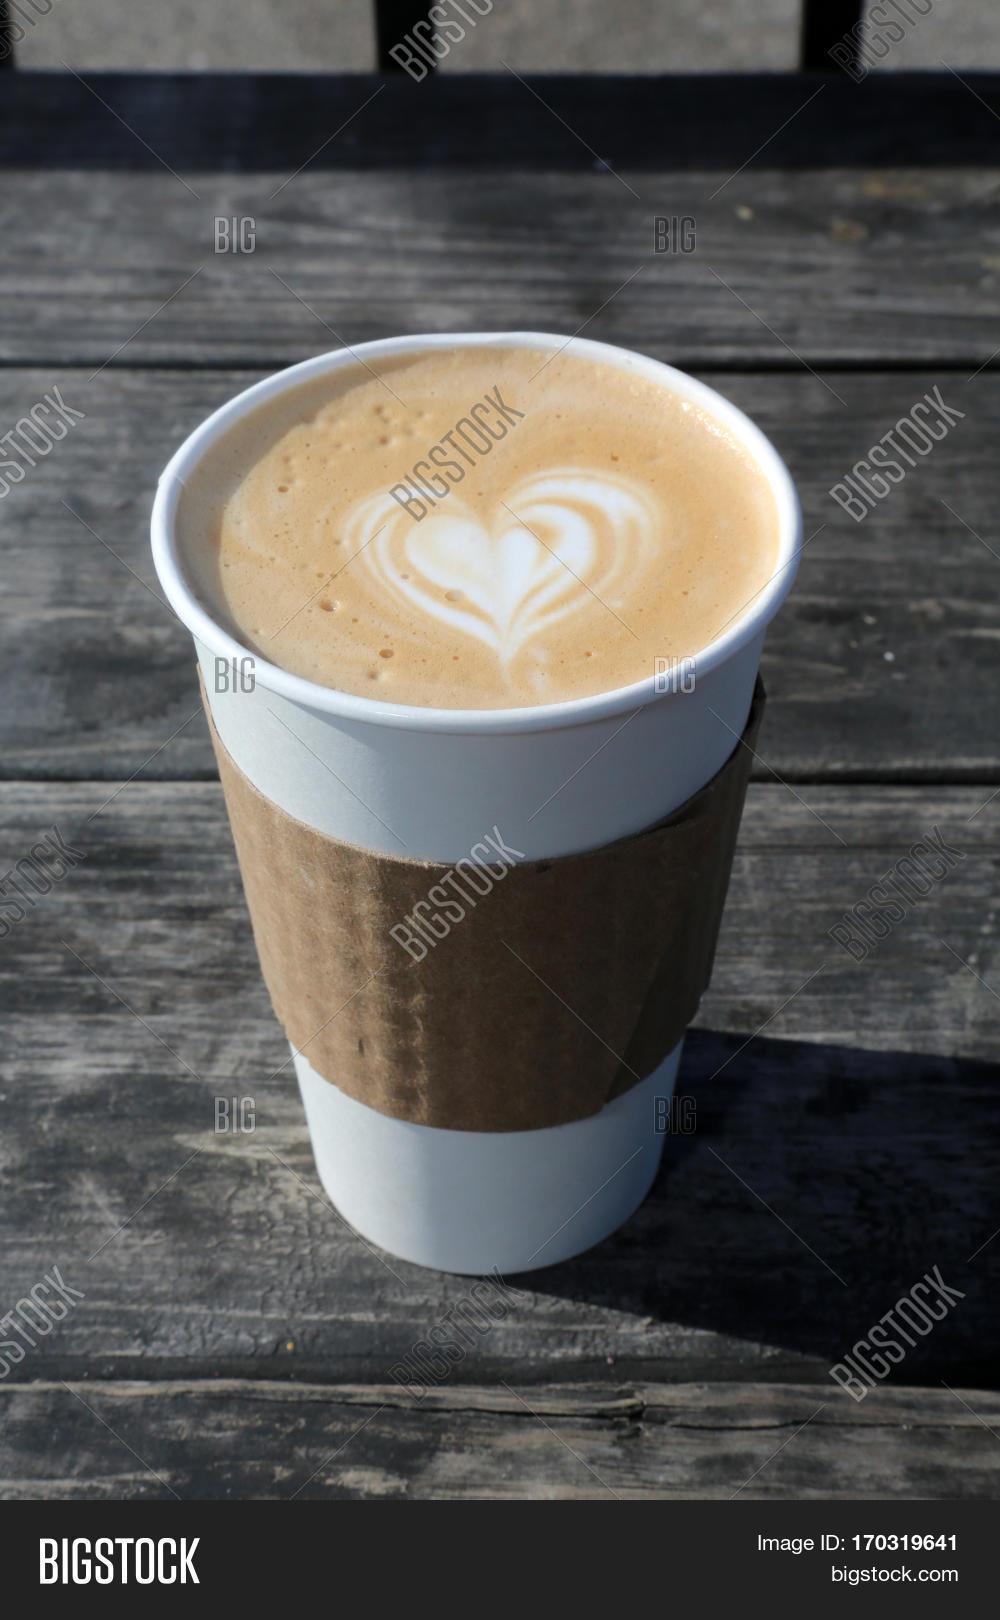 aroma,art,barista,beverage,breakfast,brown,cafe,caffeine,cappuccino,chocolate,closeup,coffe,coffee,coffee love,cream,cup,design,drink,espresso,foam,food,froth,heart,hot,hot chocolate,hot coffee,hot latte,i love coffee,italian,latte,latte art,latte art heart,latte coffee,latte cup,latte foam,latte isolated,latte love,latte macchiato,liquid,love,milk,mocha,morning,mug,paper coffee cup,paper cup,paper latte cup,tasty,valentine,valentines day